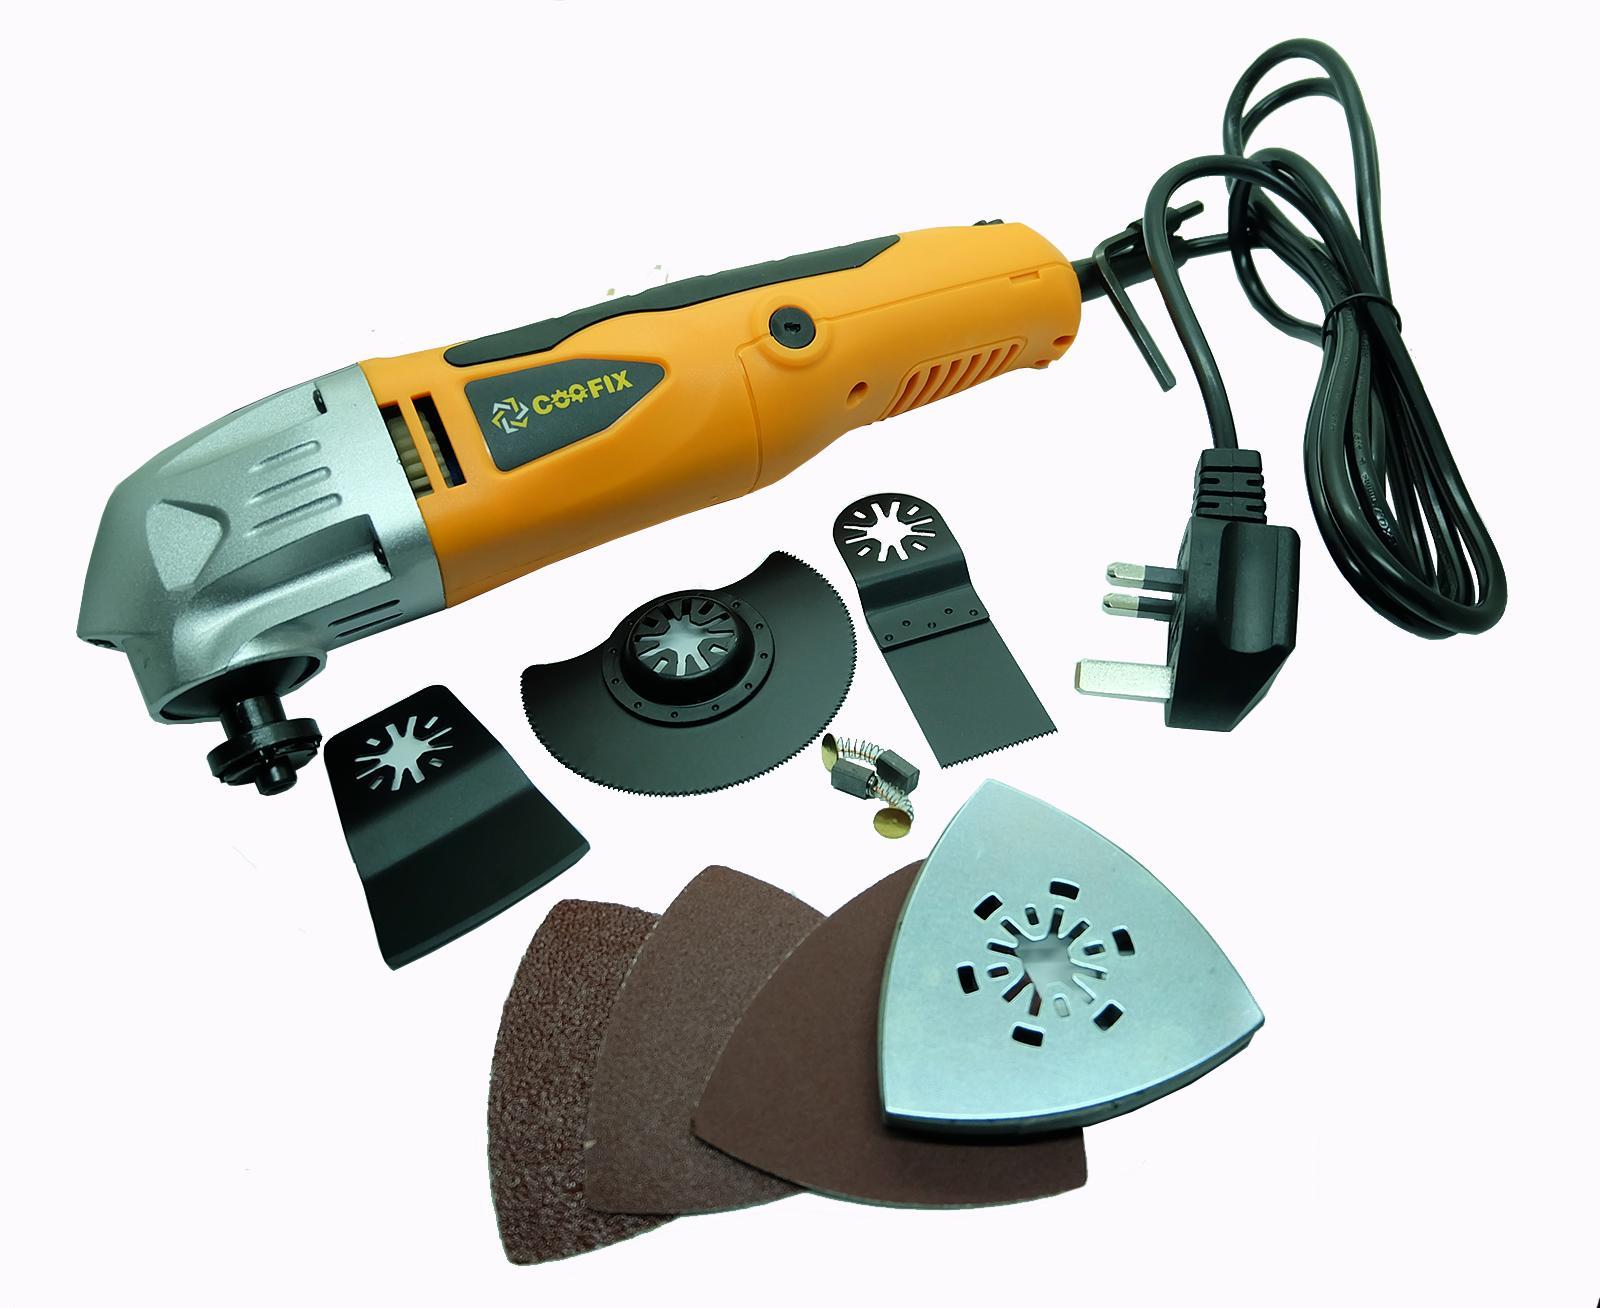 Coofix 300 Watts Multi Purpose Cutter Oscillating Shovel Tool